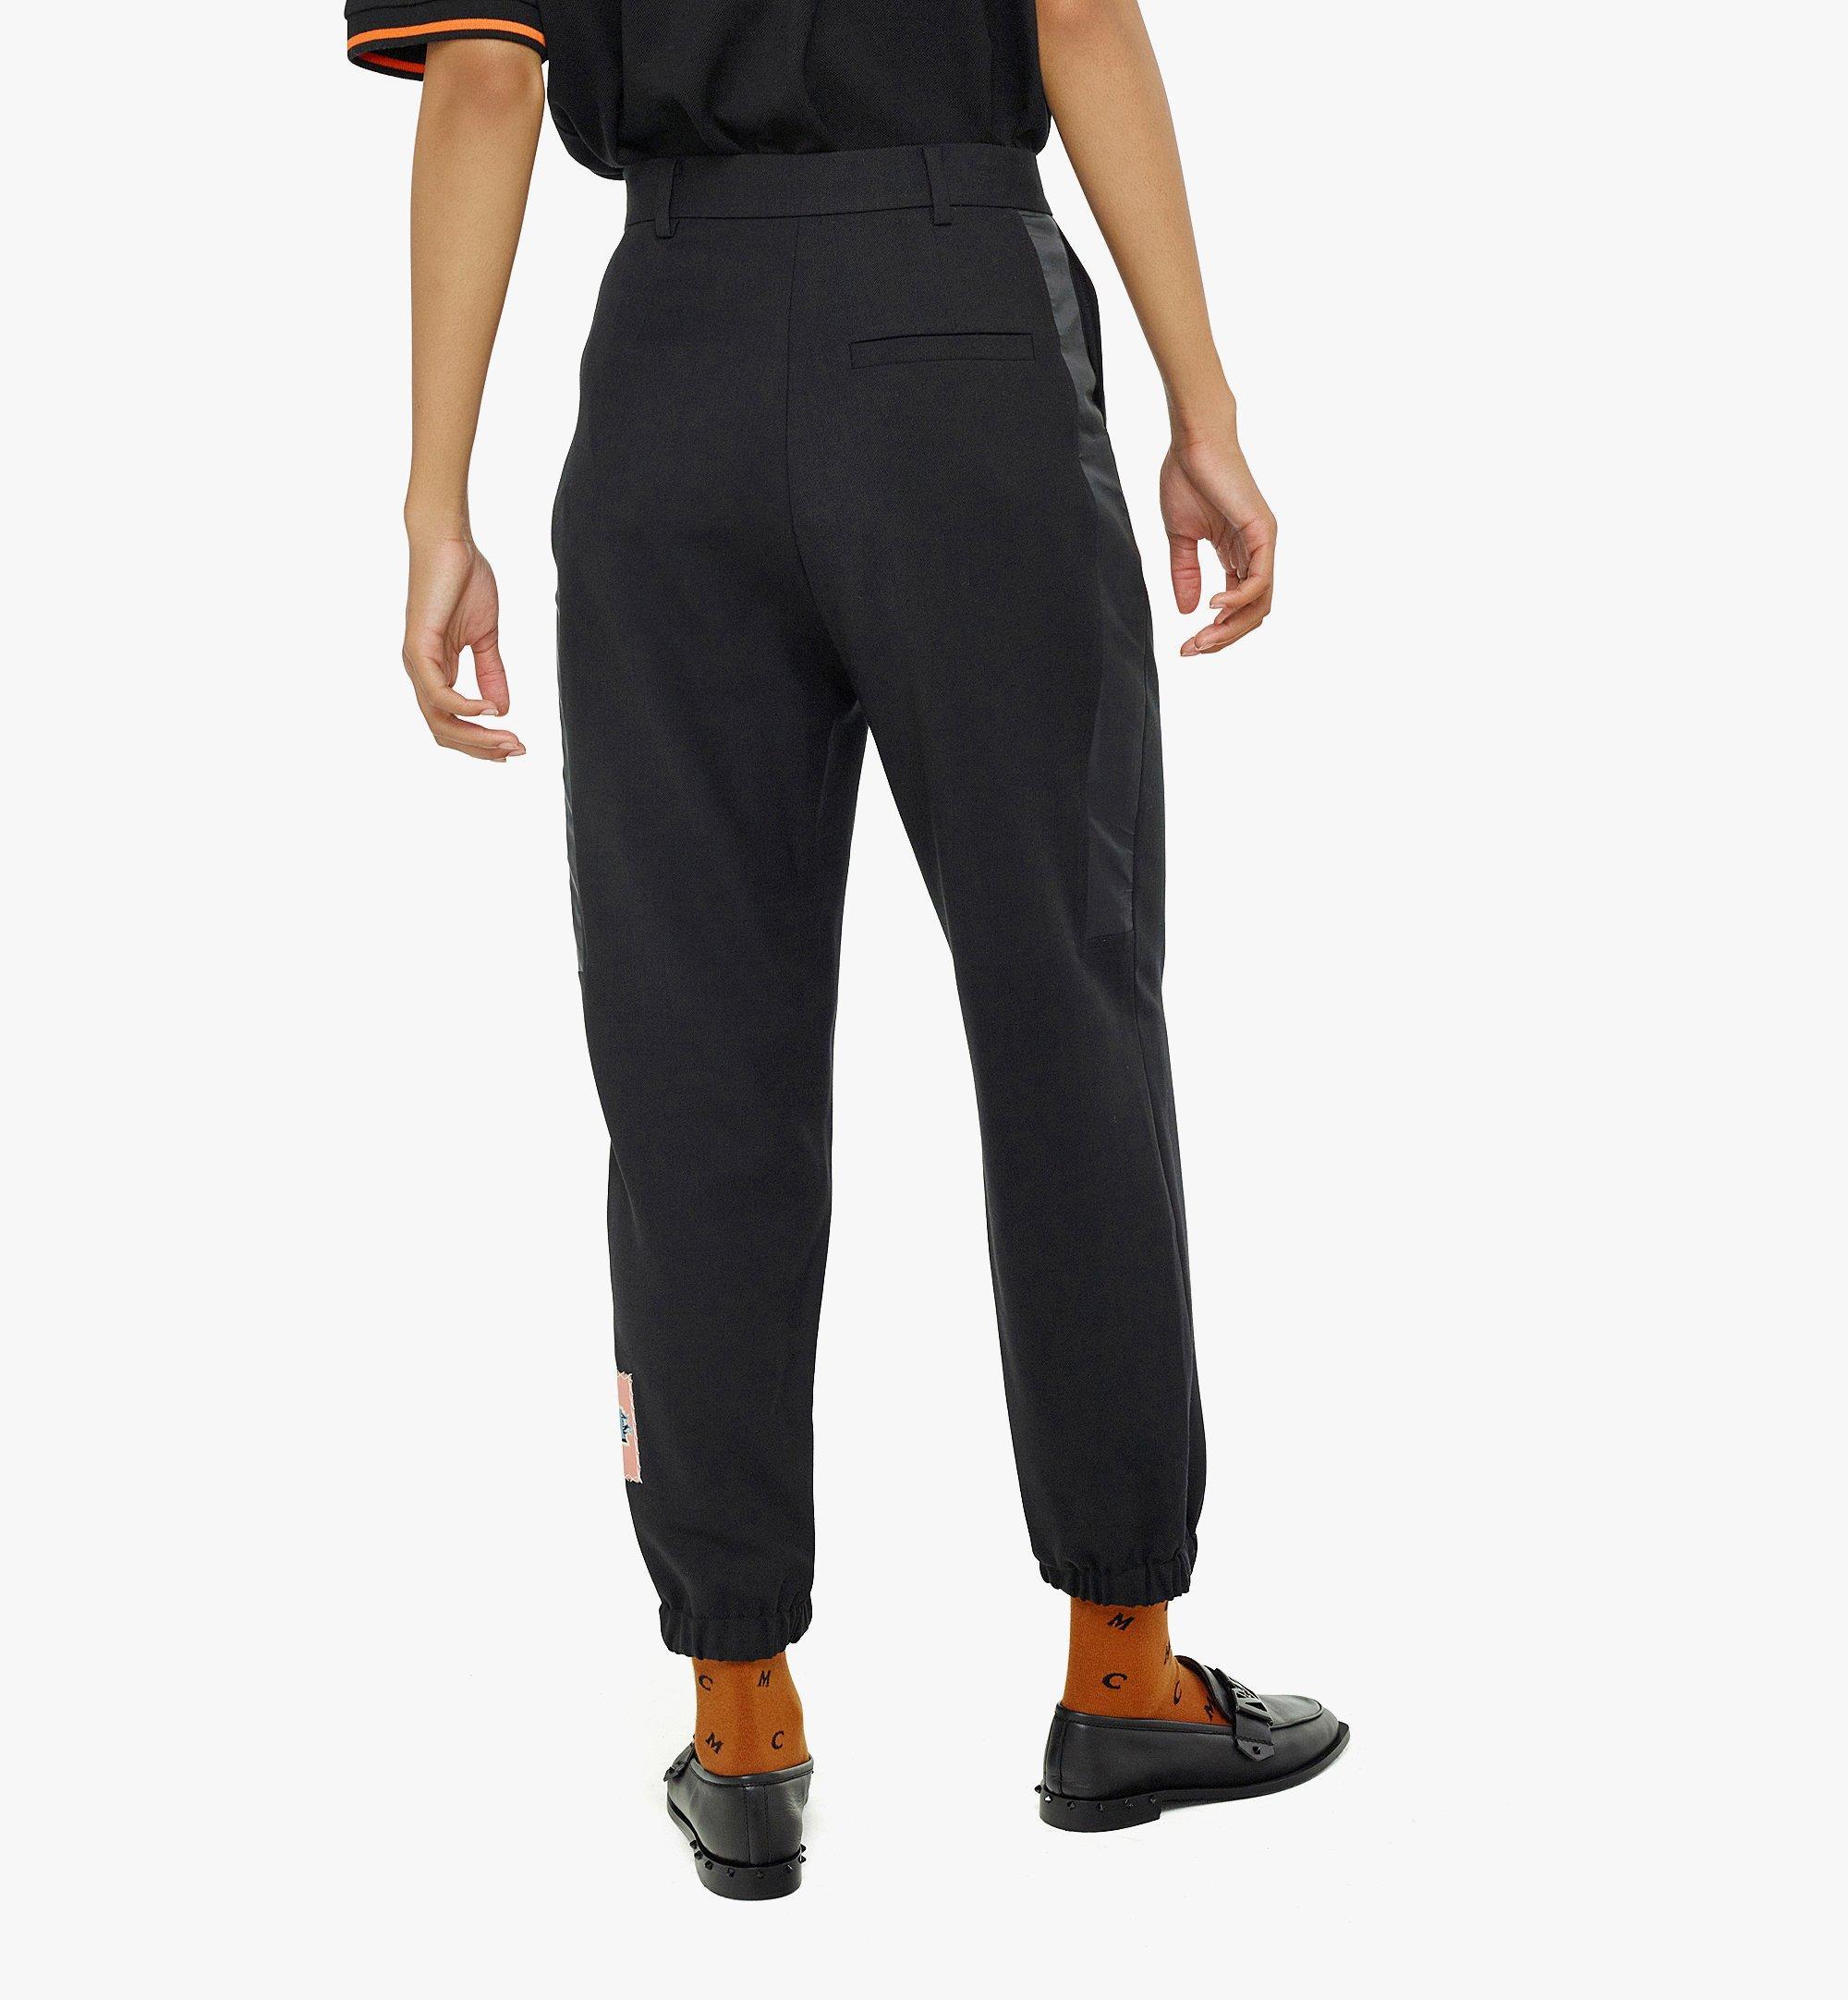 MCM Women's Wool Jogging Pants Black MFPBAMM02BK040 Alternate View 3